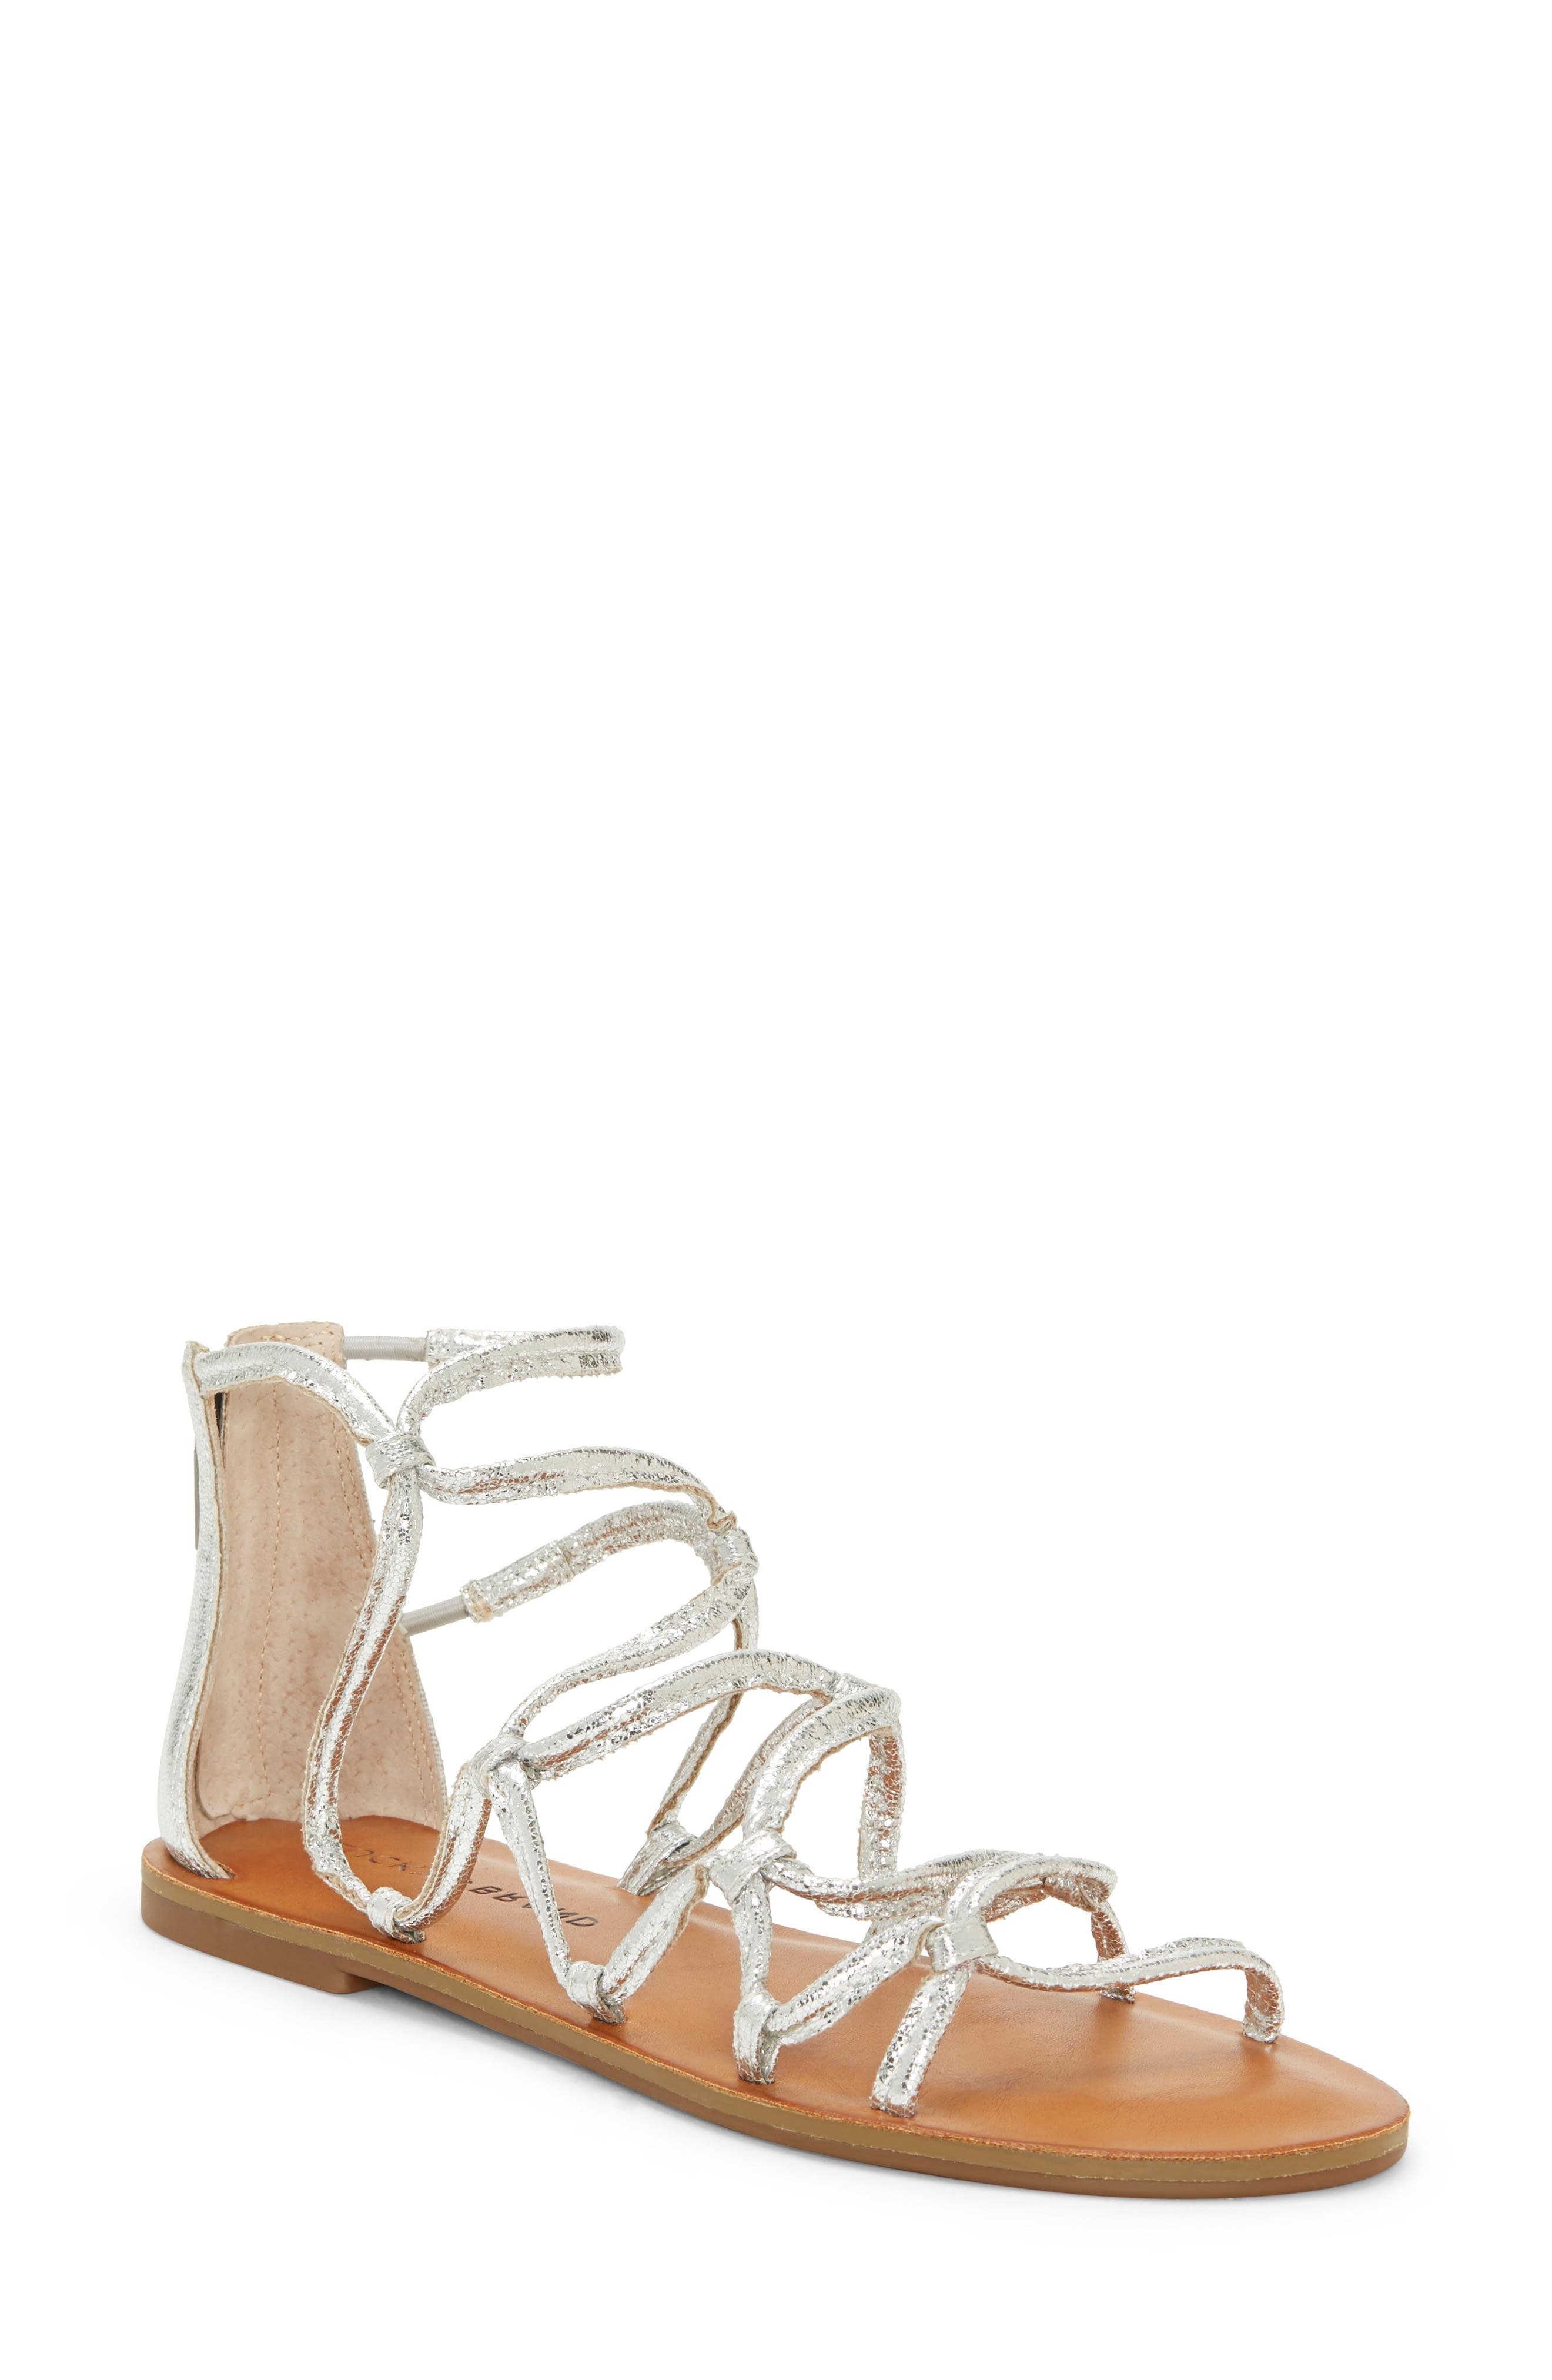 Lucky Brand Anisha Sandal, Metallic